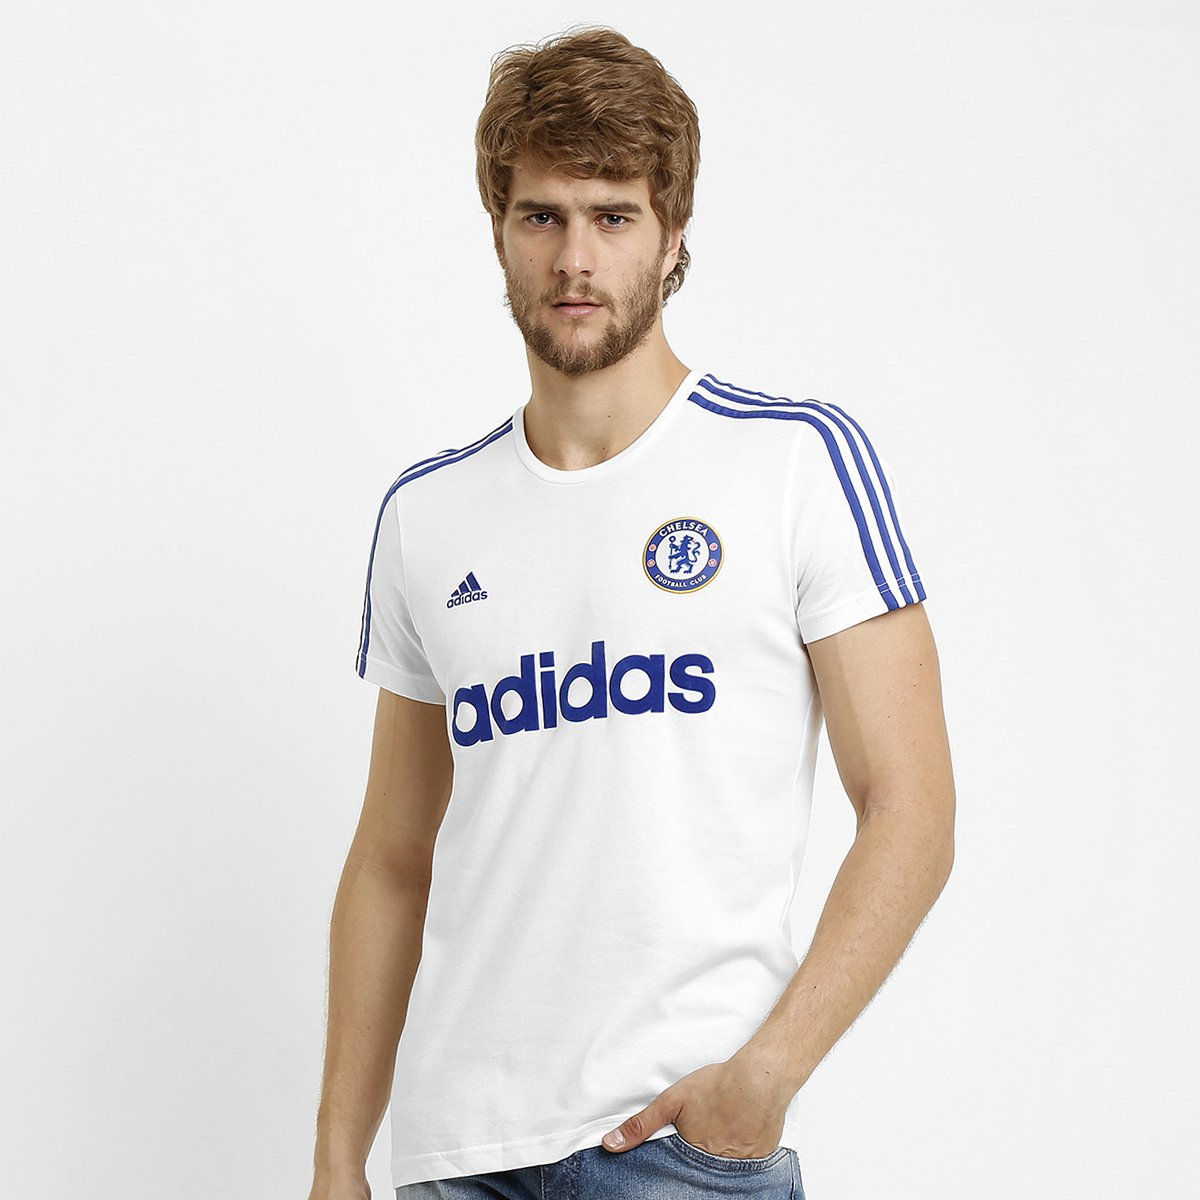 3d719ec7ad31a Camiseta Adidas Chelsea Retrô - Compre Agora